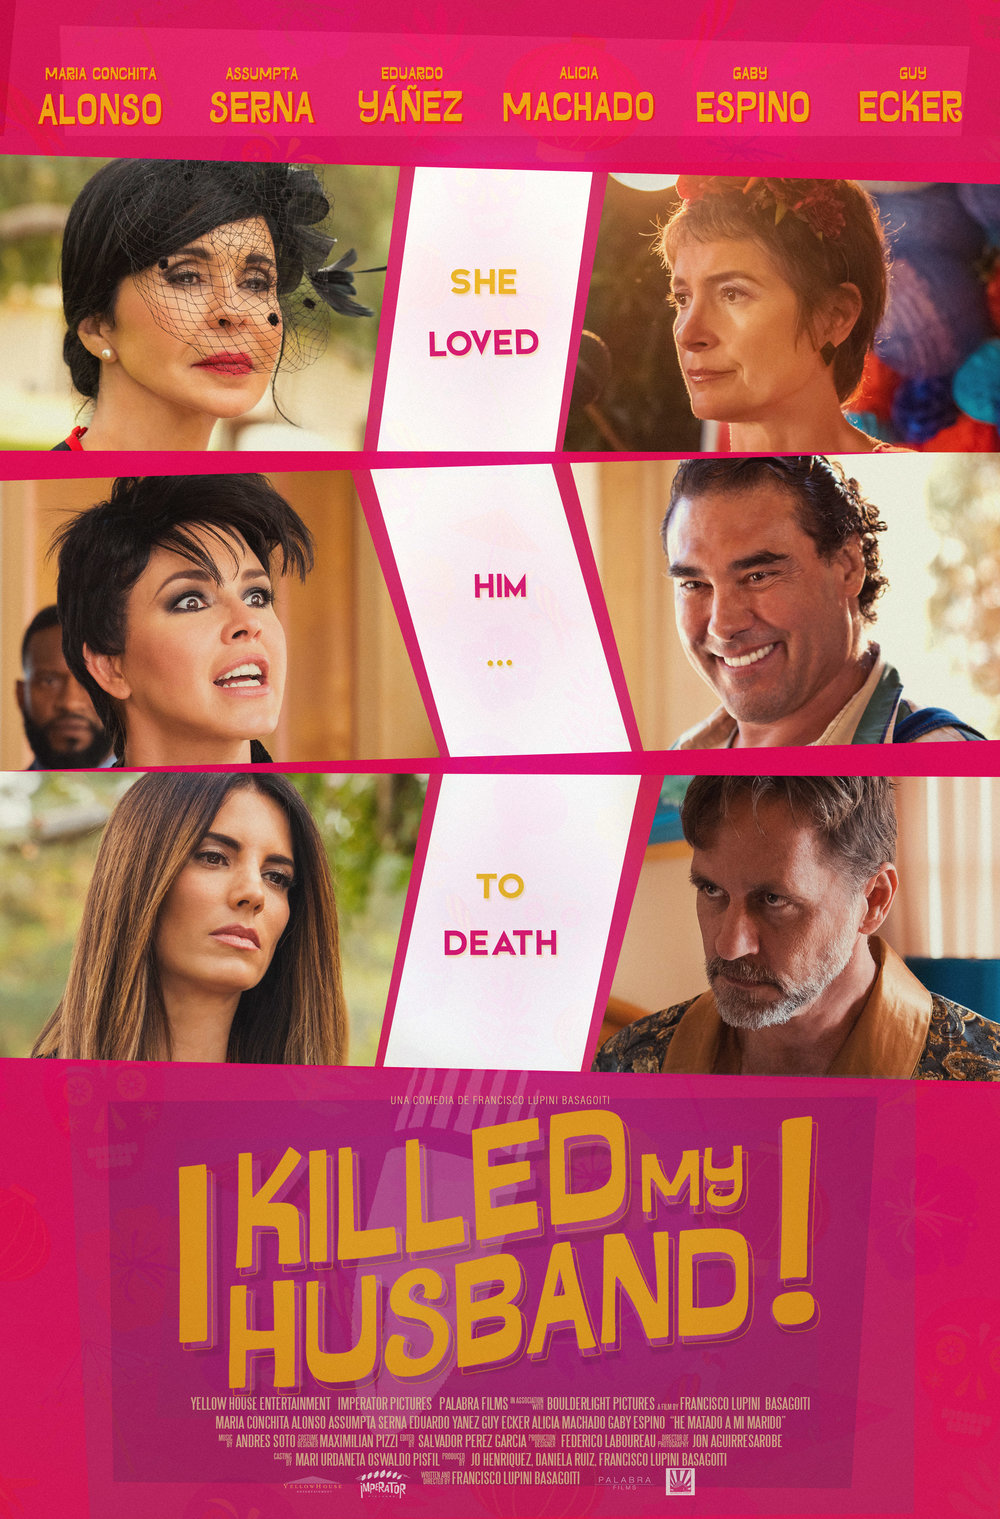 he matado a mi marido I killed my husband